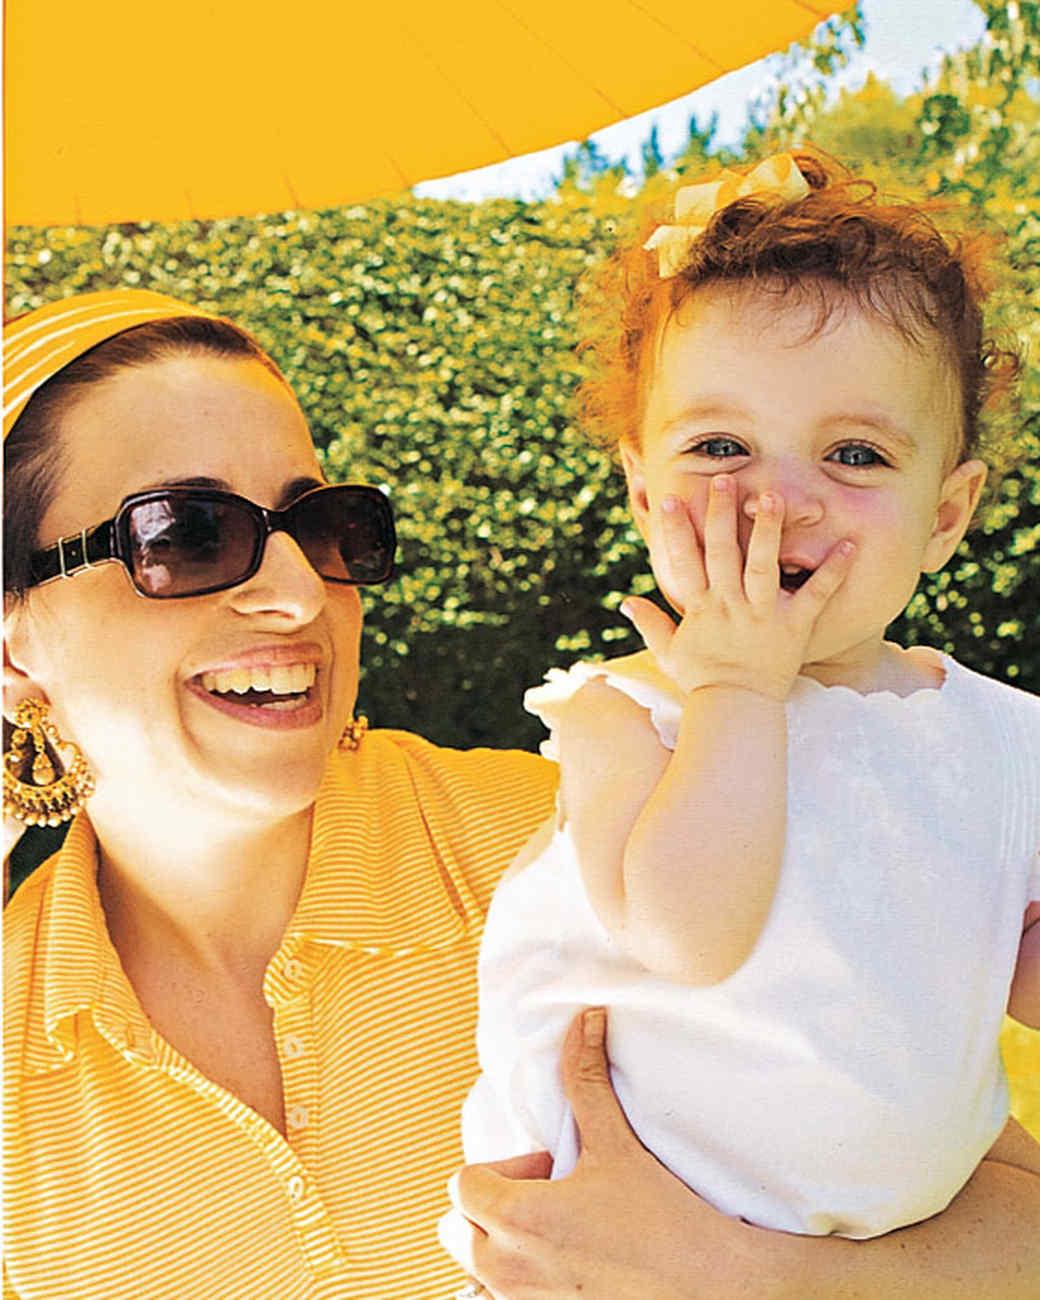 daisys-birthday-mks1029-daisy8.jpg